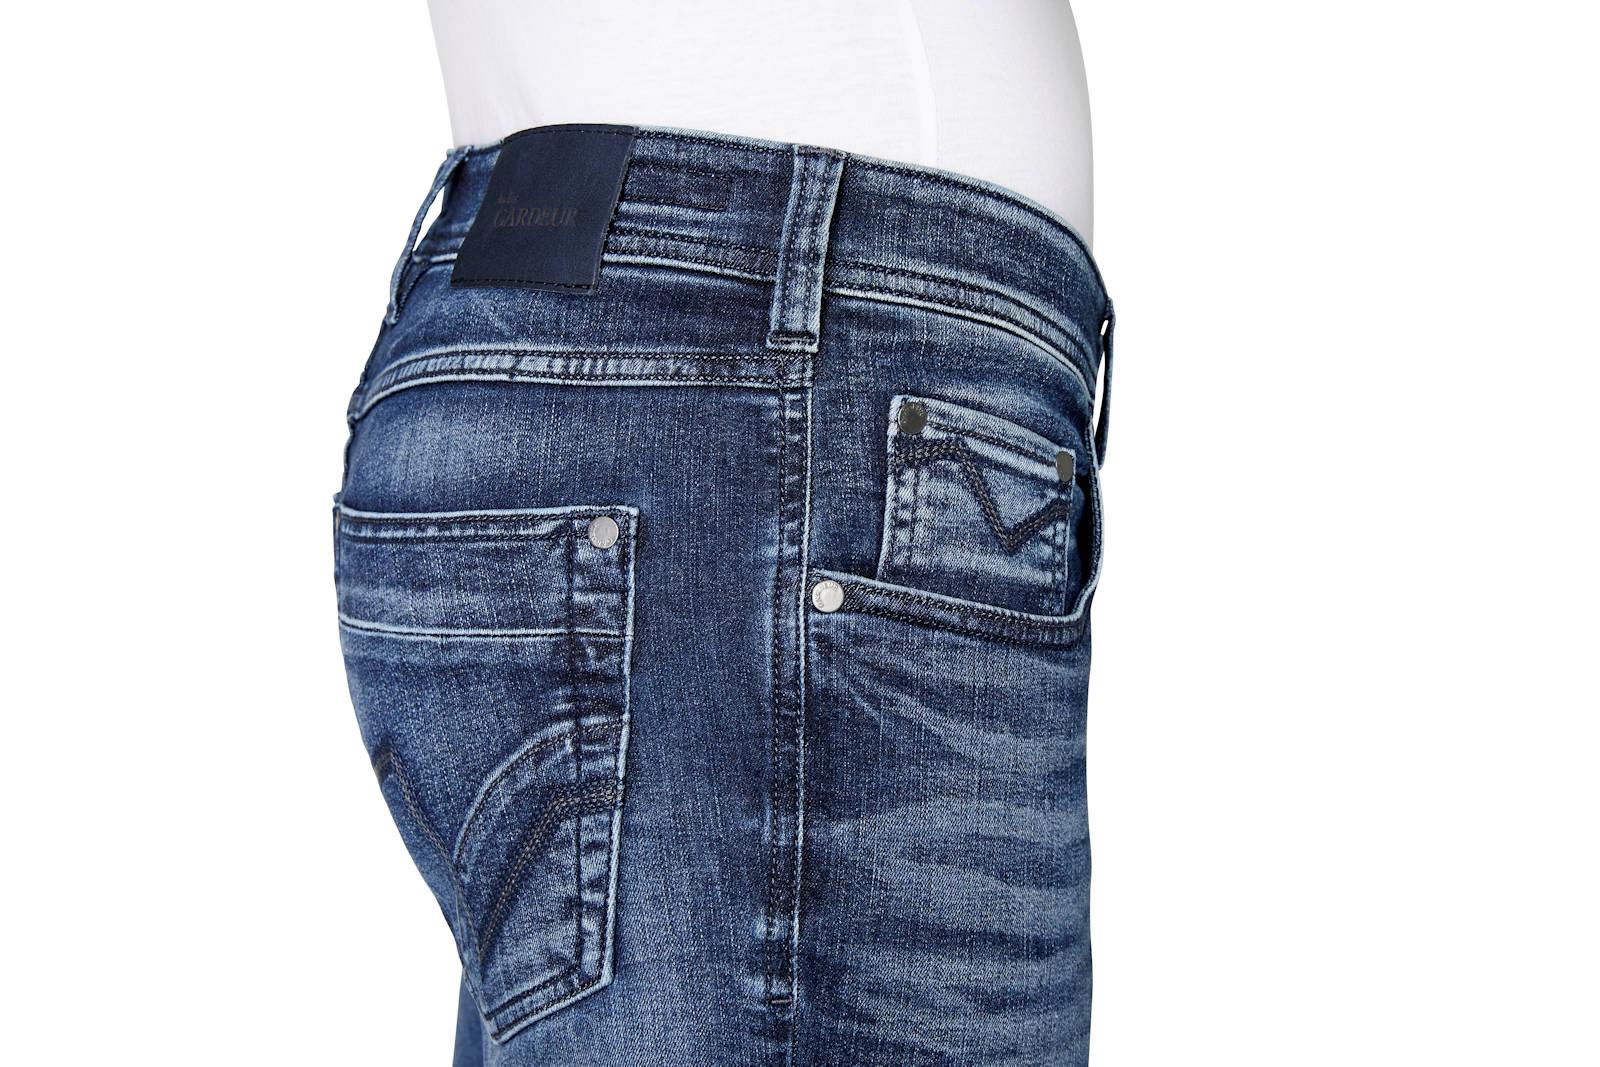 Atelier-GARDEUR-Jeans-BILL-8-Modern-Fit-Herren-Hose-Slim-Leg-Denim-NEU Indexbild 9